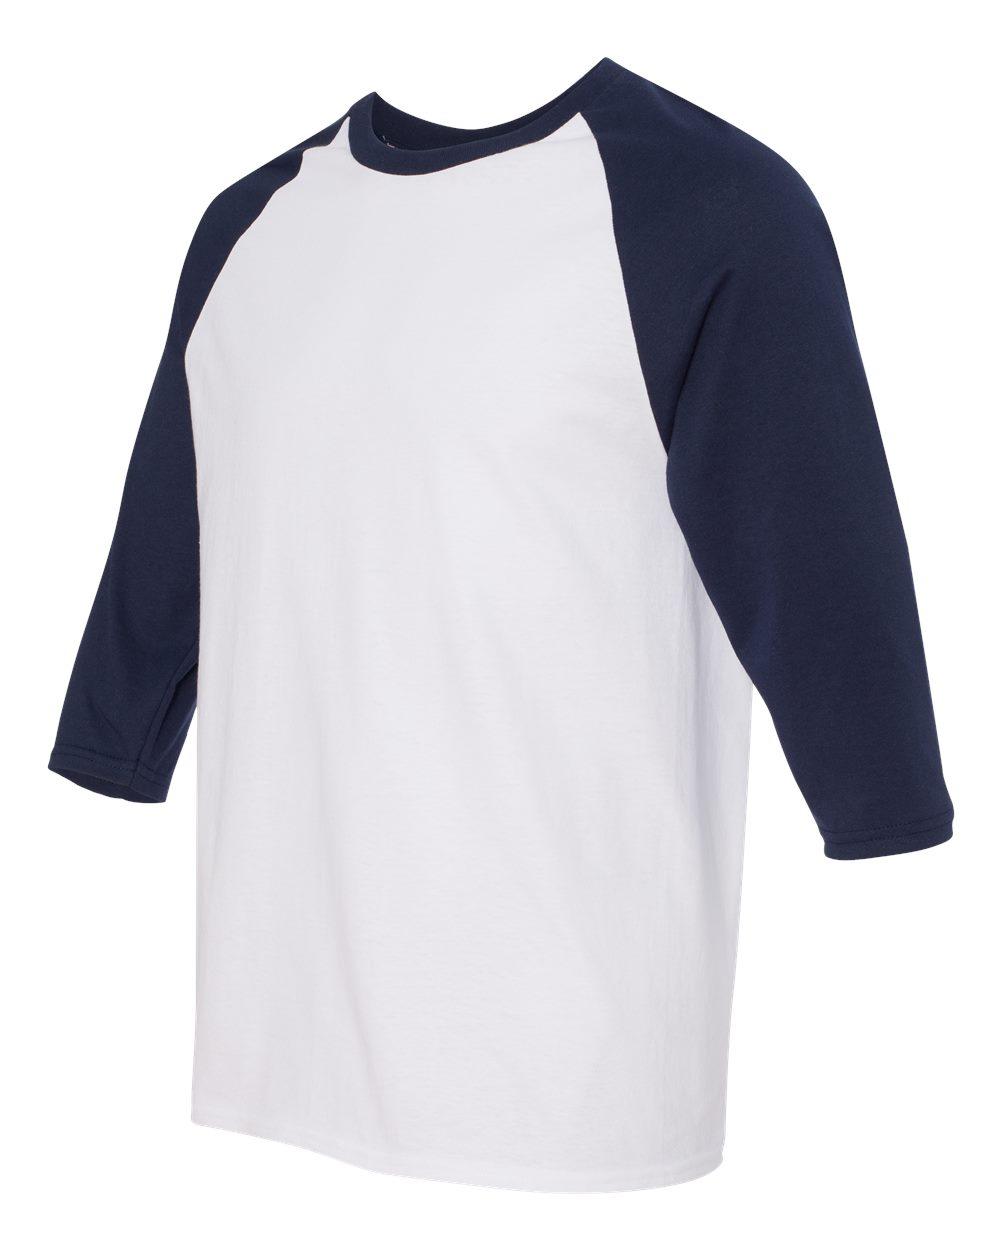 Gildan 5700 Heavy Cotton Three Quarter Raglan Sleeve